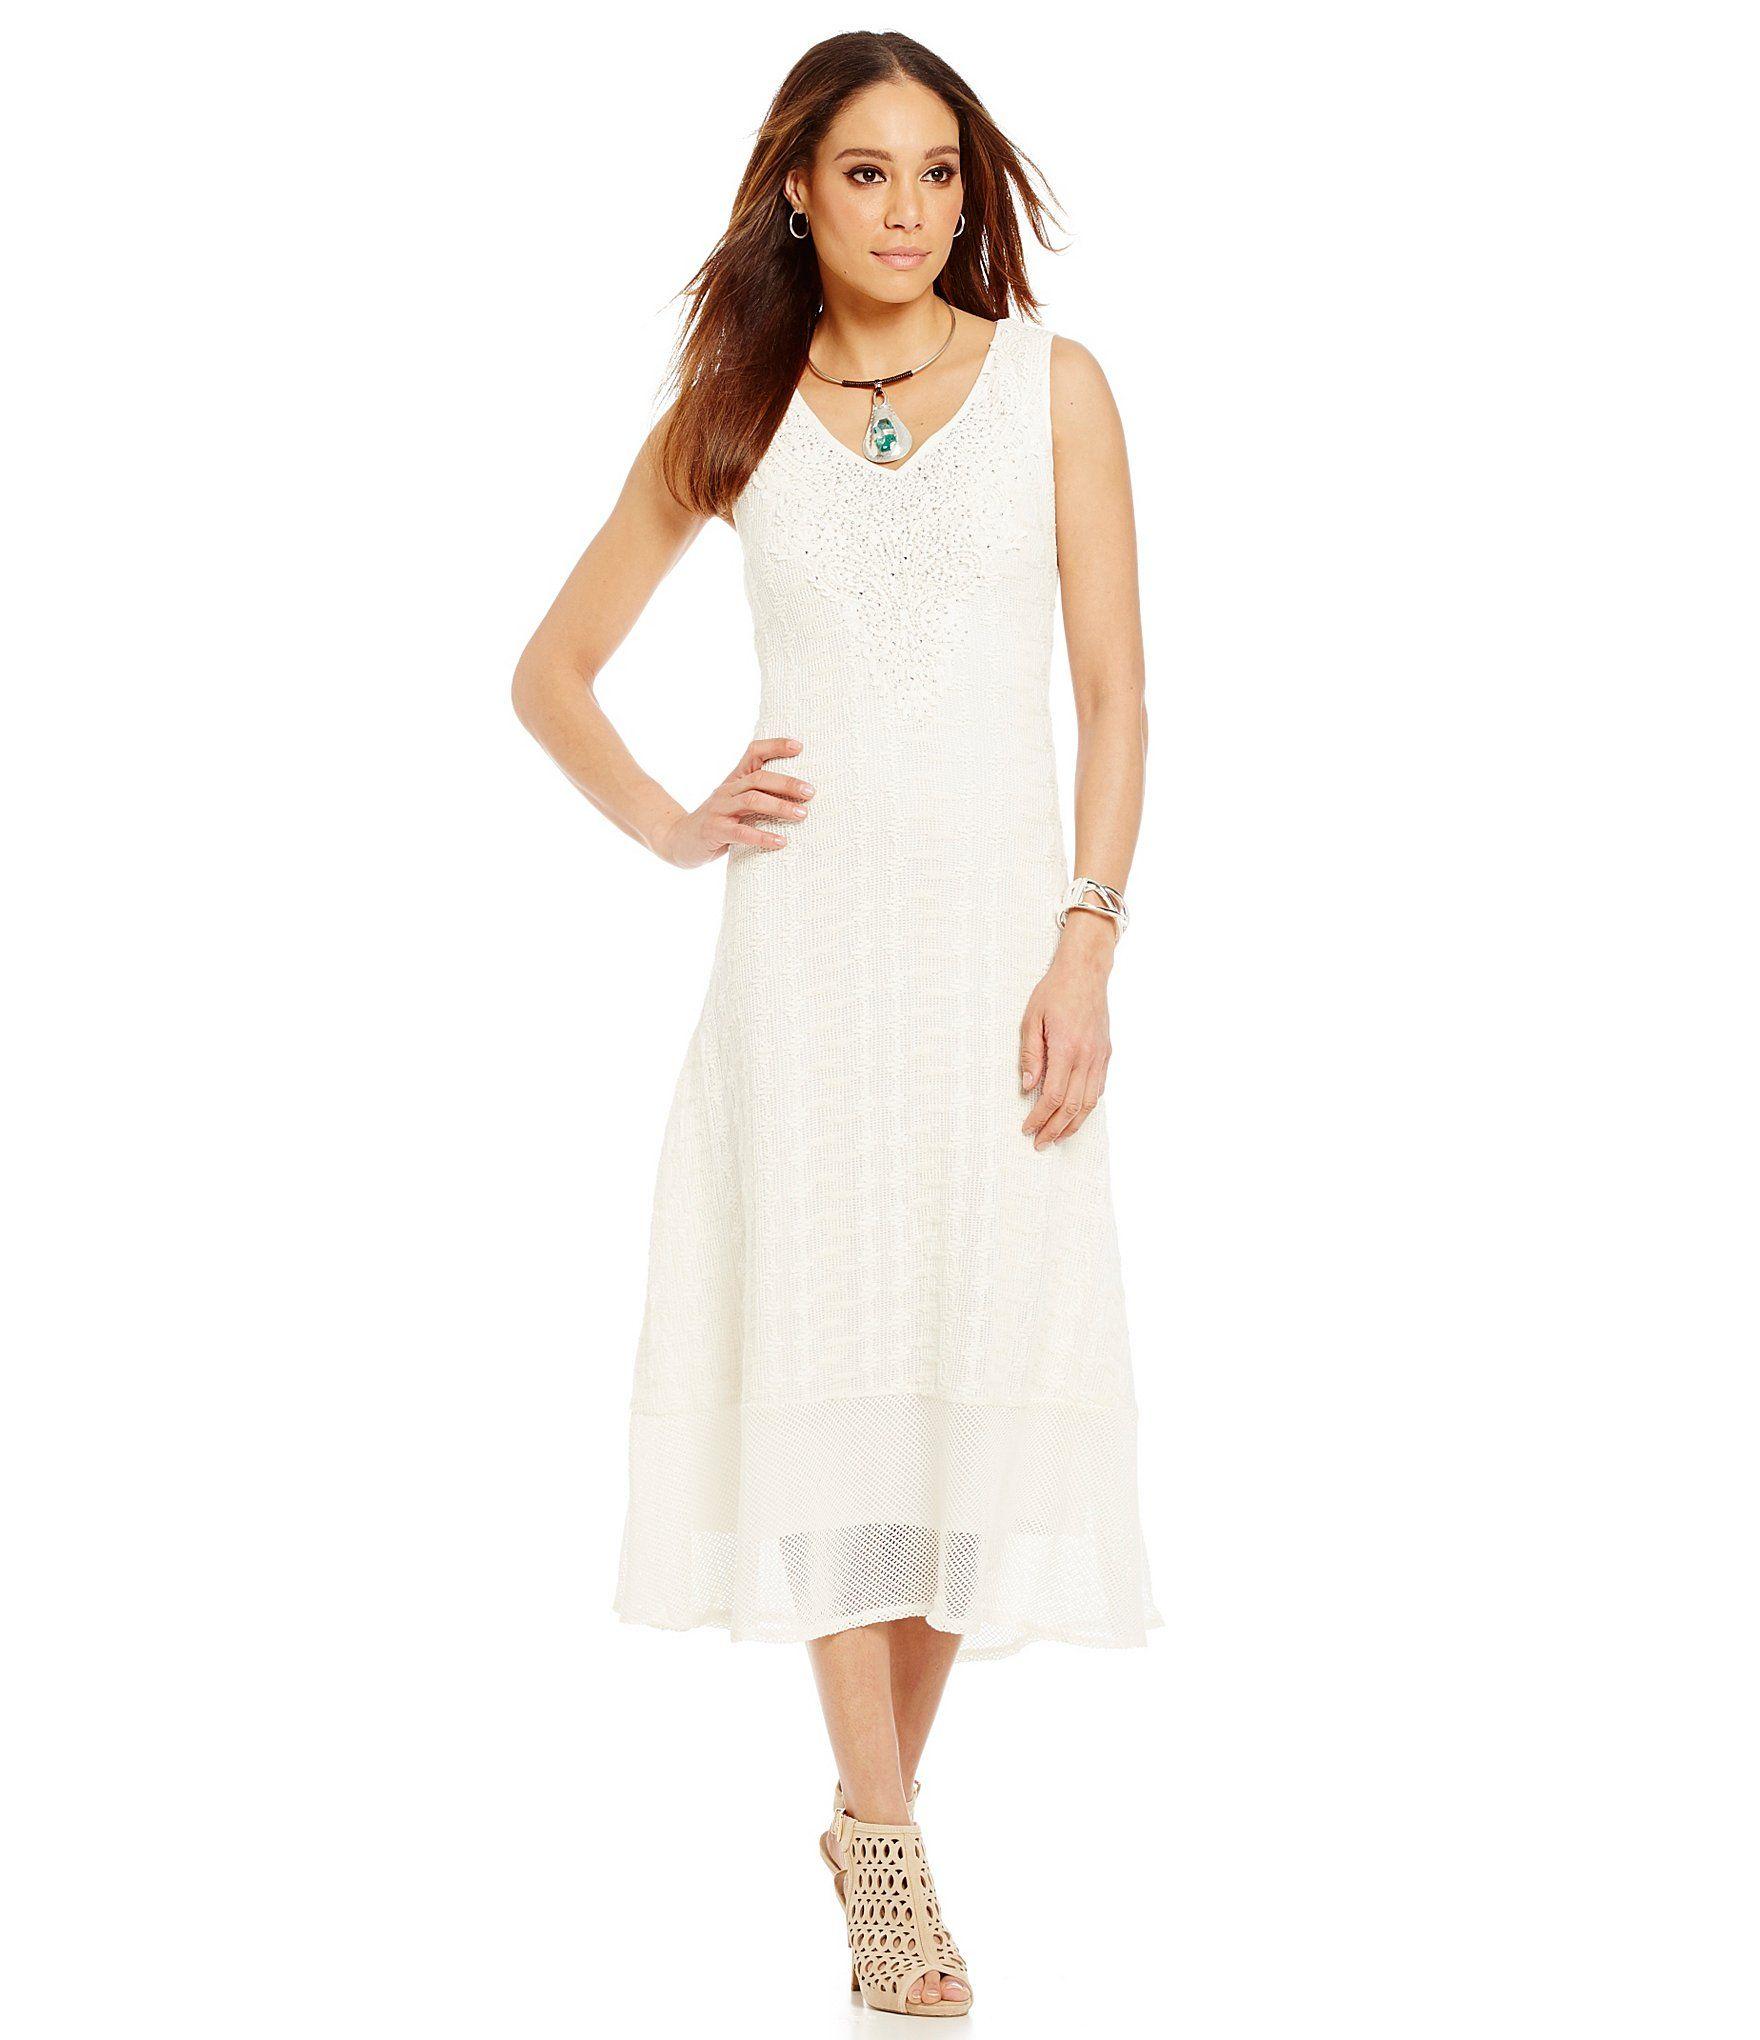 a4879830d2 White Dresses At Dillards